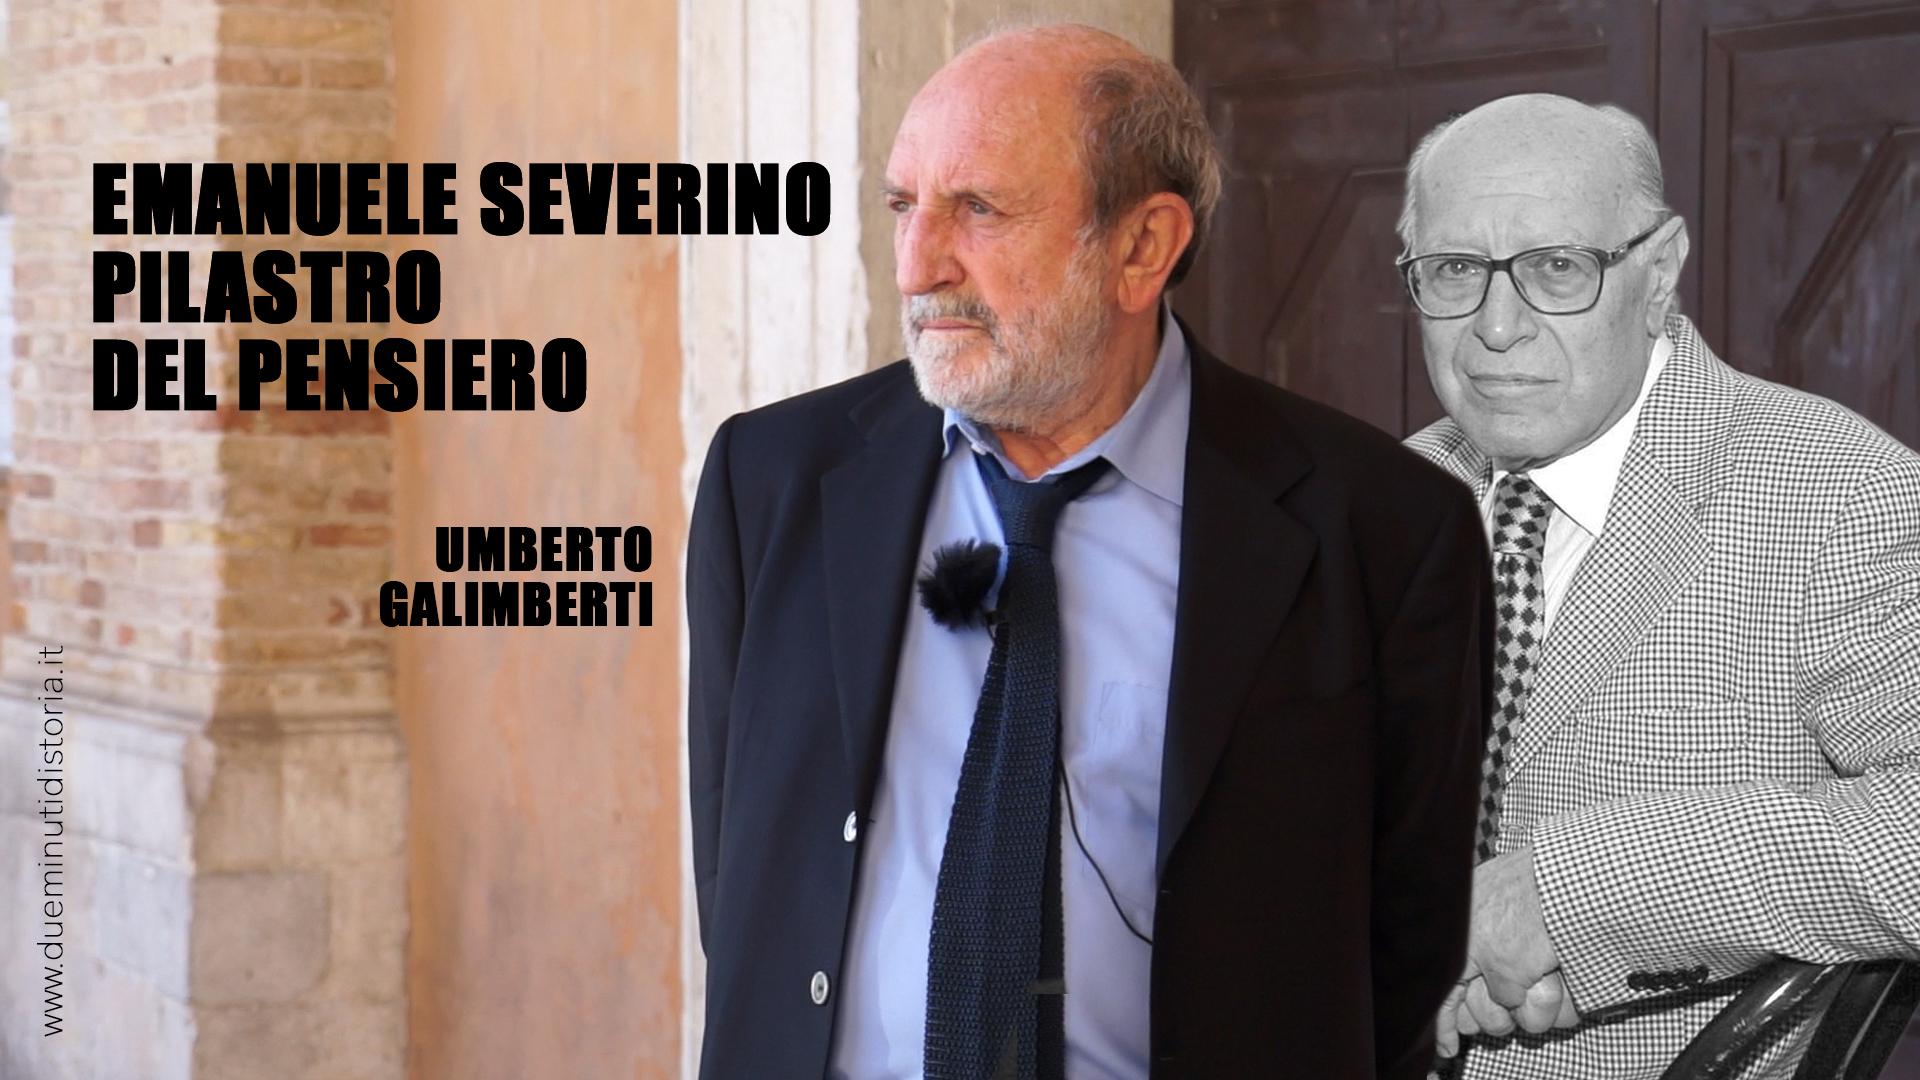 Umberto Galimberti: «Emanuele Severino, il mio maestro»